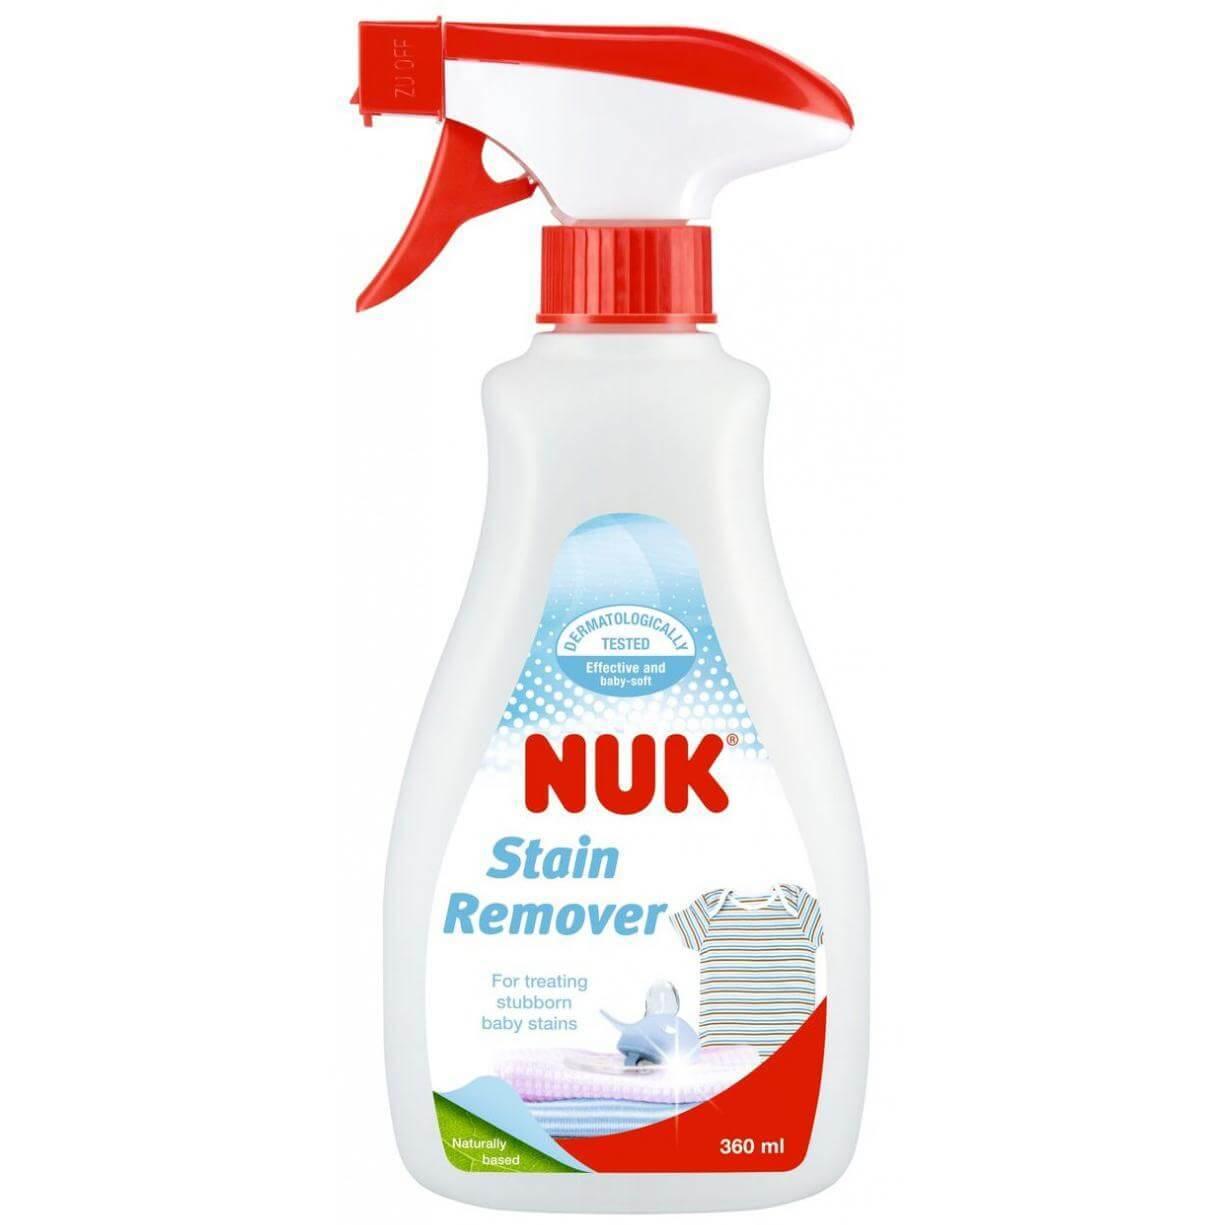 Nuk Stain Remοver Καθαριστικό κατά των Επίμονων Λεκέδων στα Βρεφικά Ρούχα 360ml